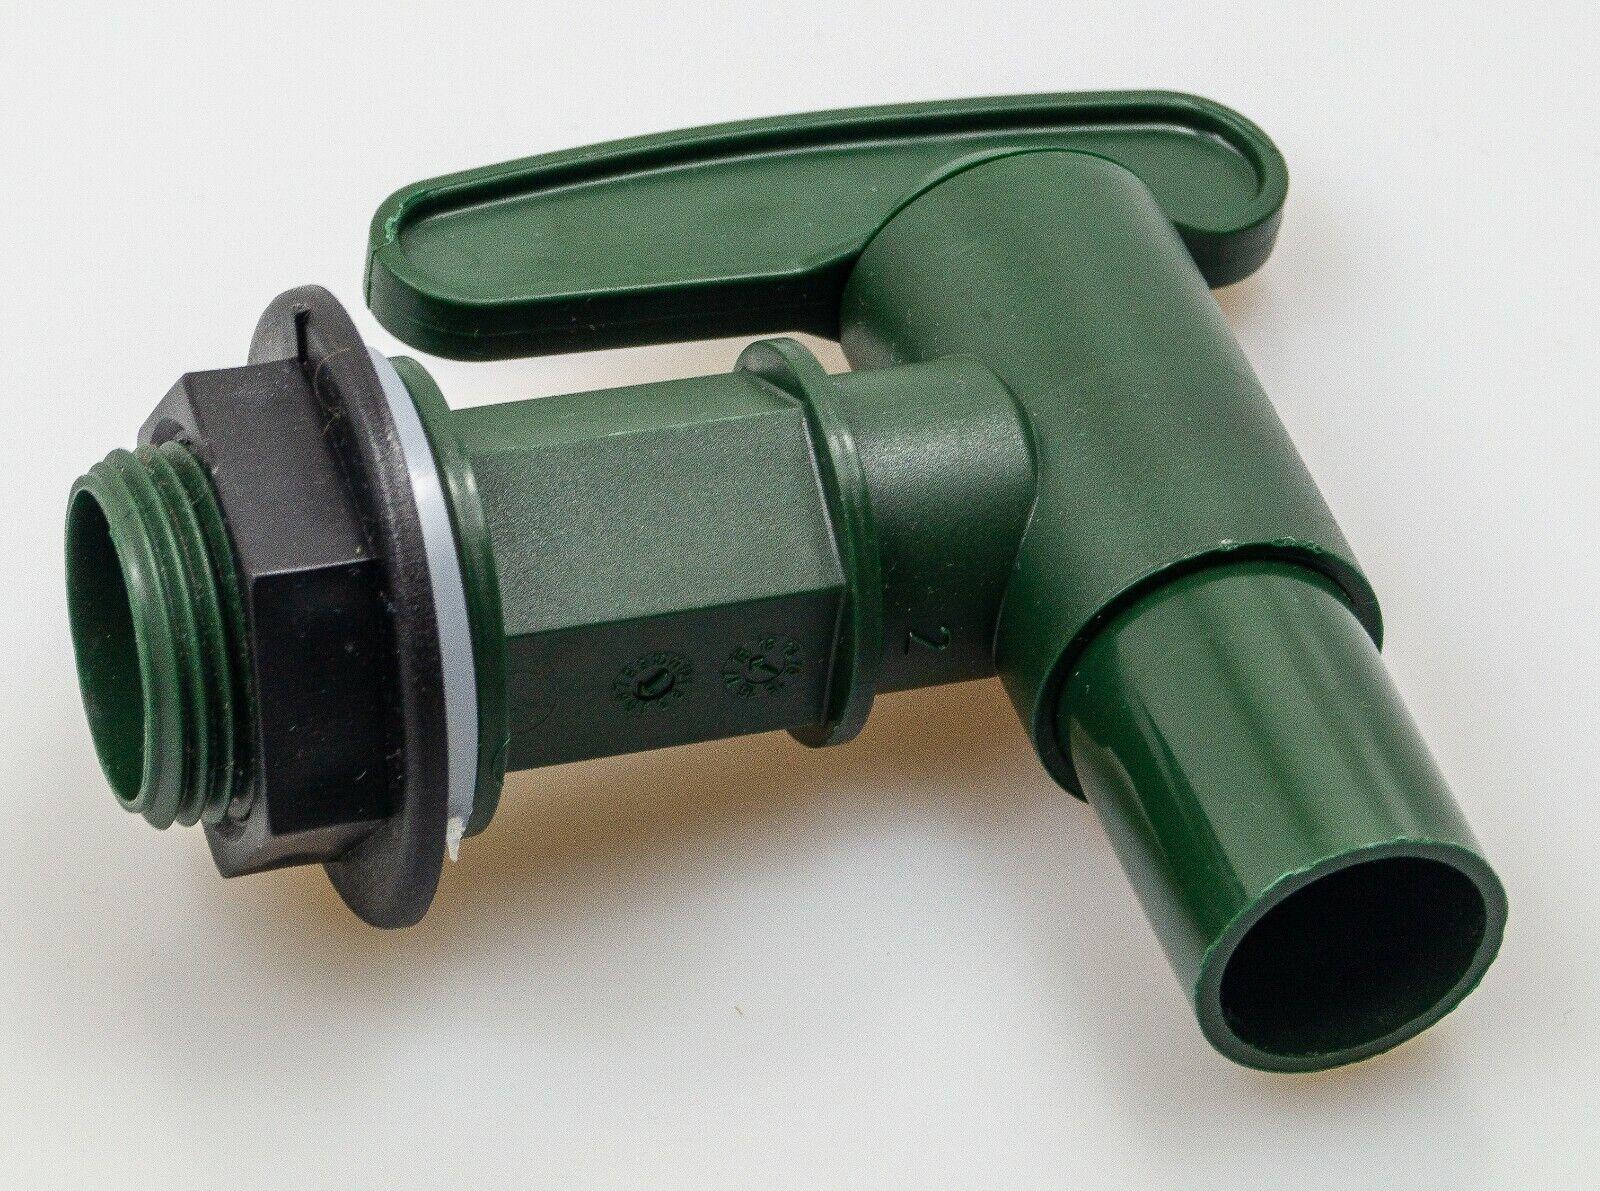 Garantia Auslaufhahn GRÜN (Wasserhahn), 19 mm (3/4